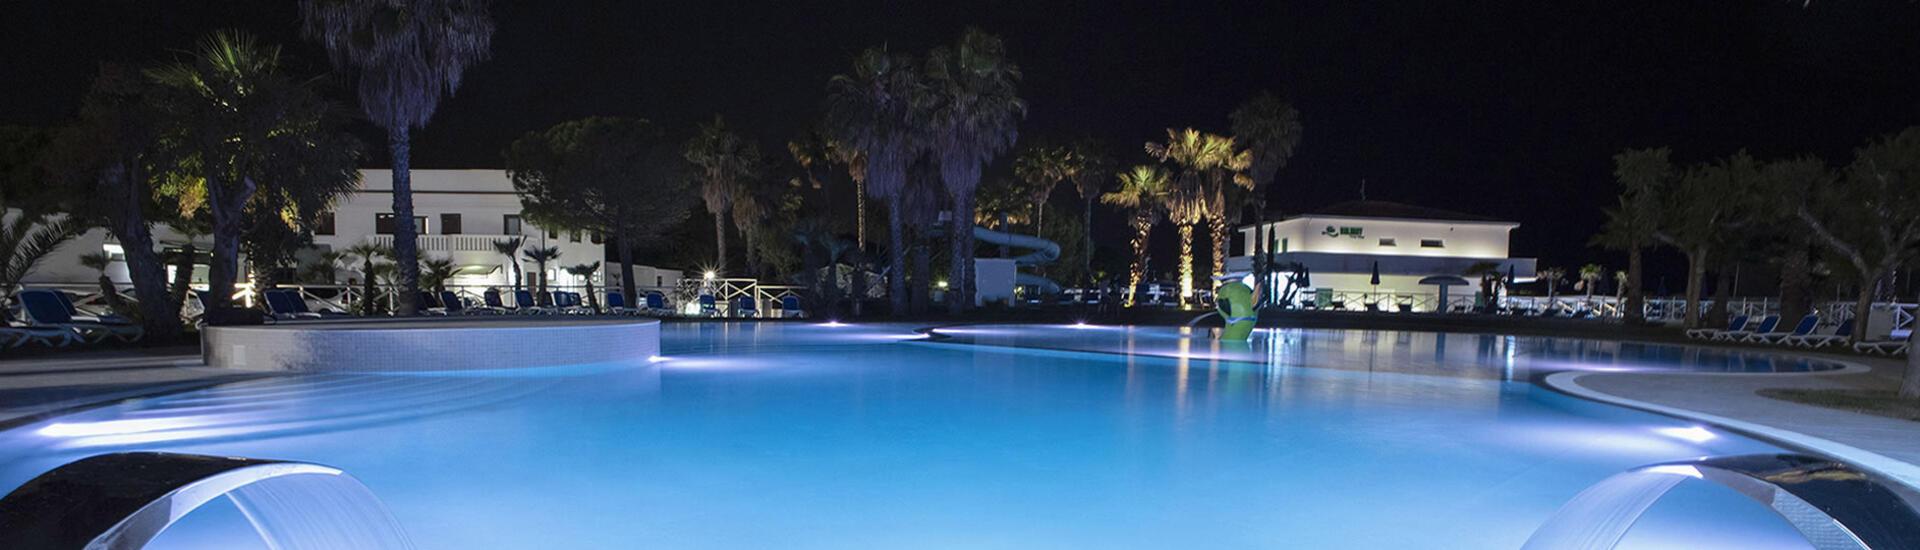 holidayfamilyvillage en sensory-waterfront 012